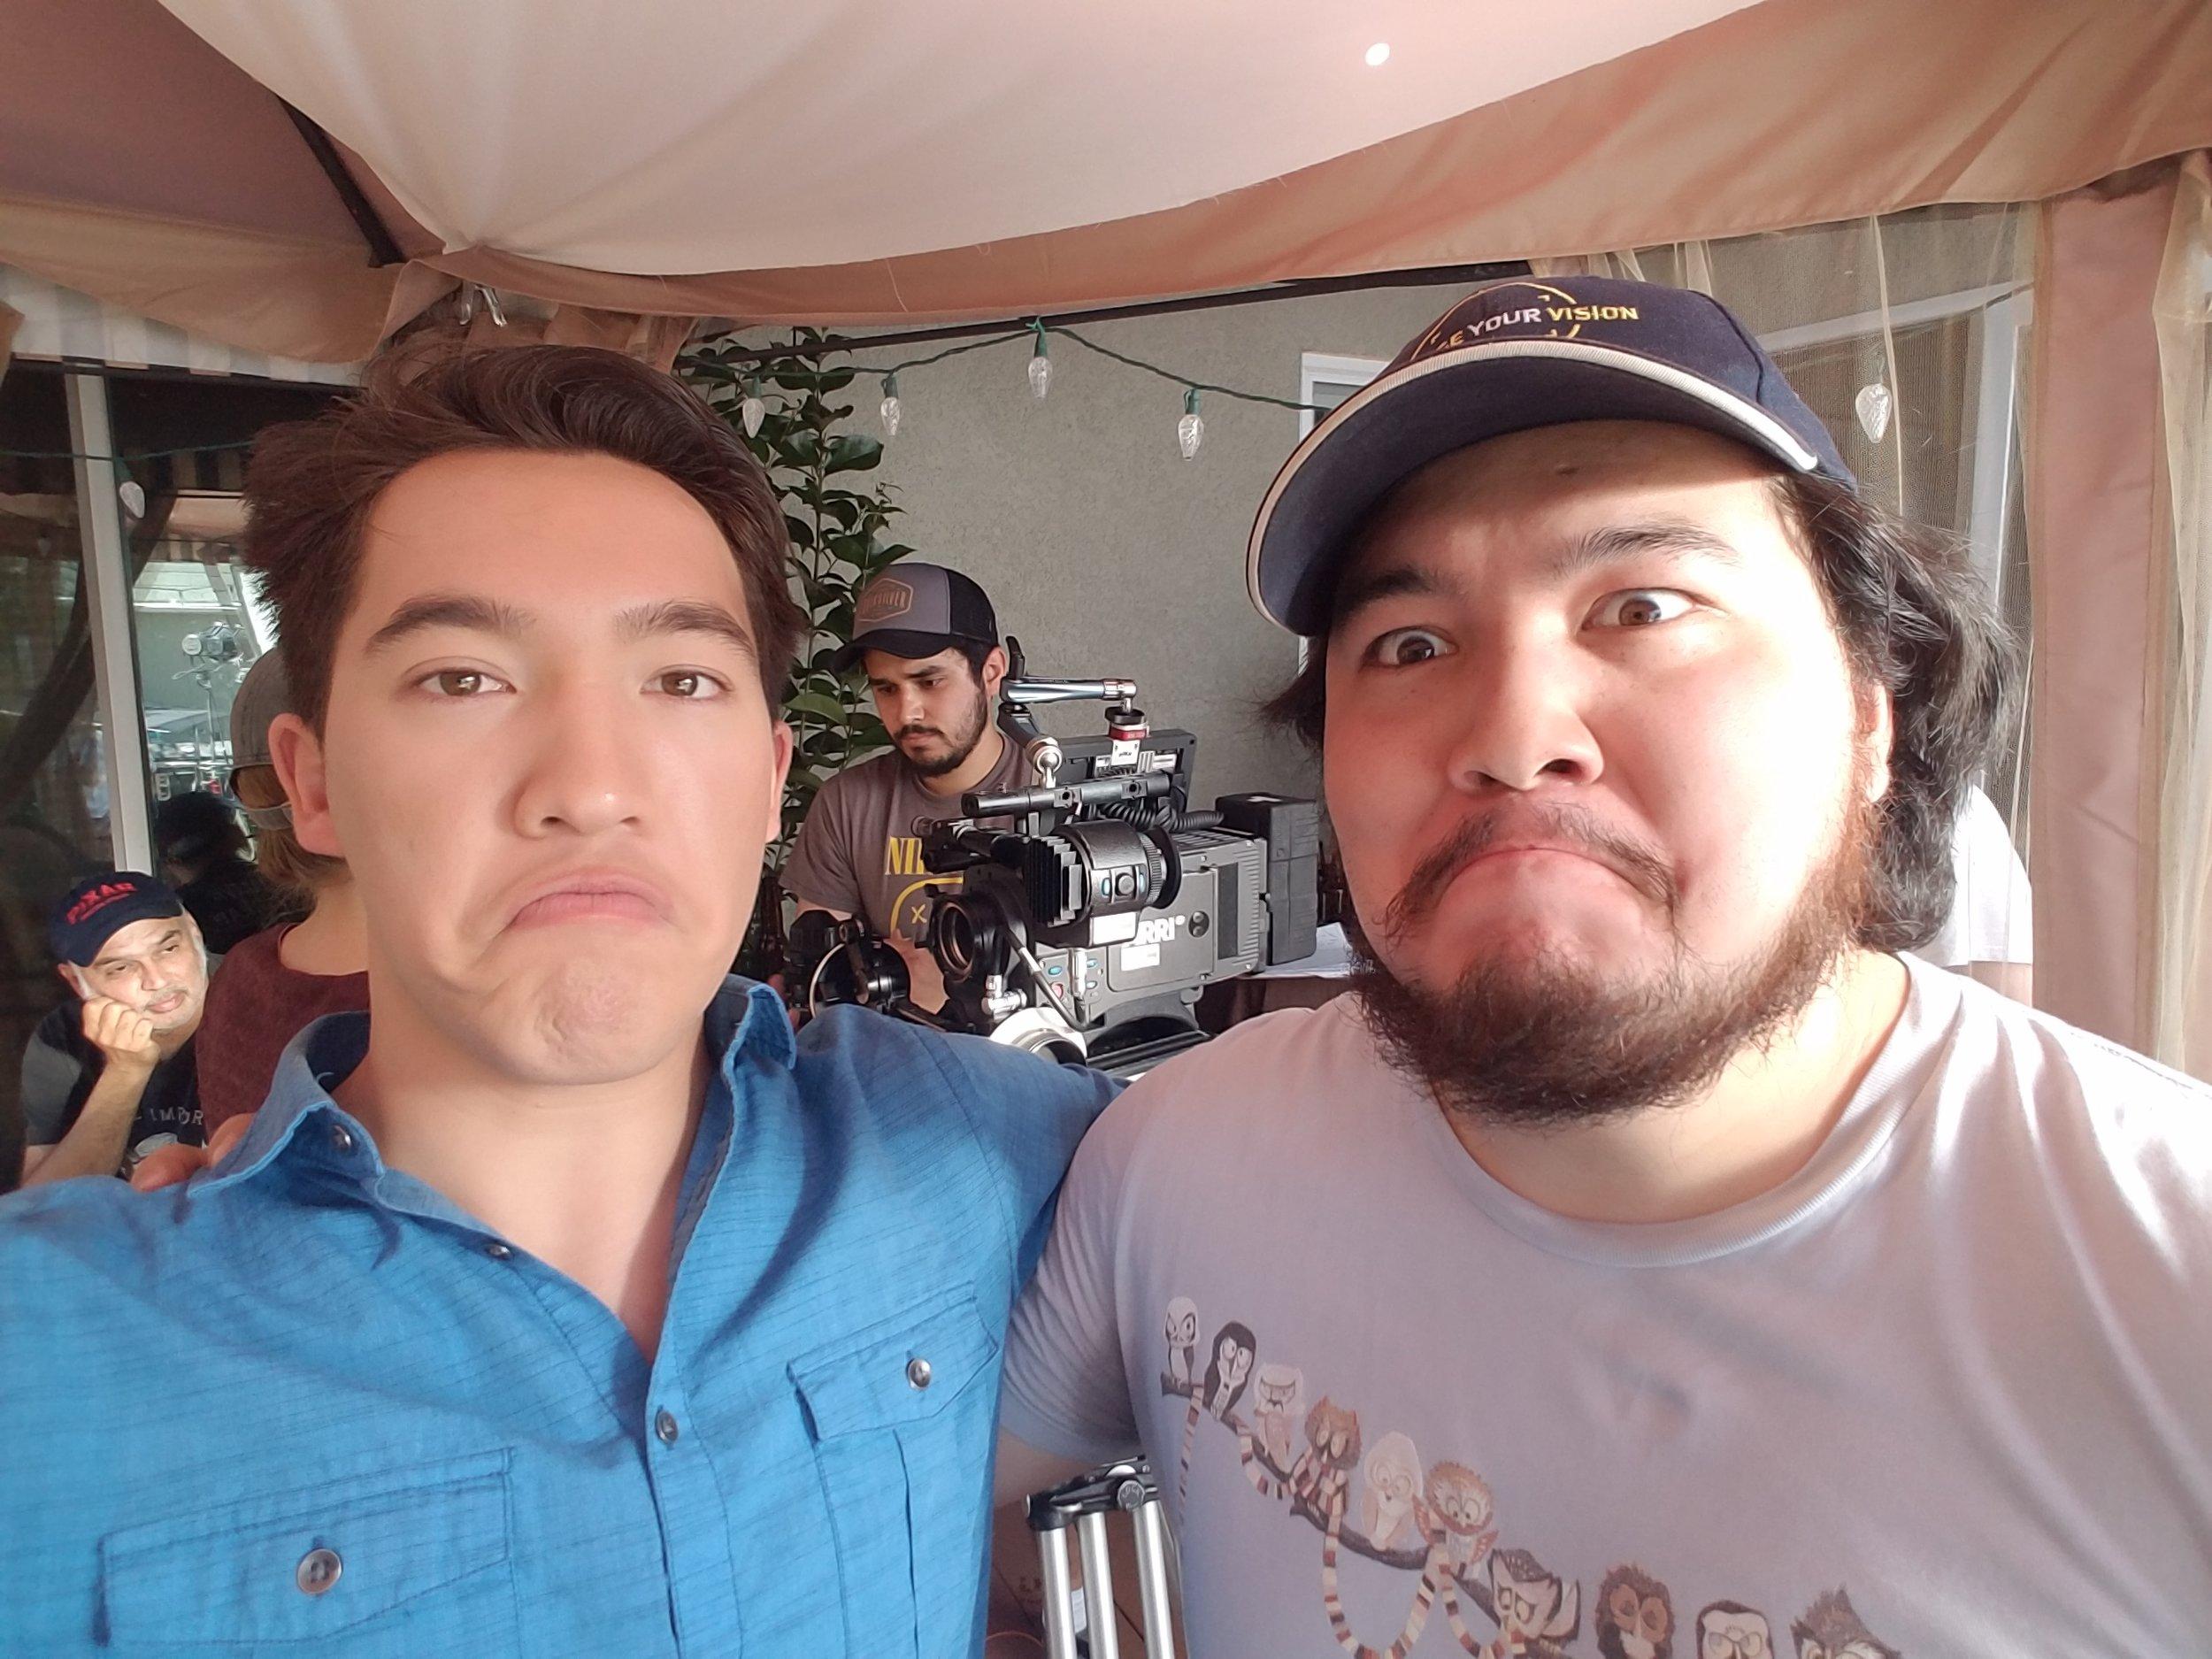 Brothers who make films together, scowl together